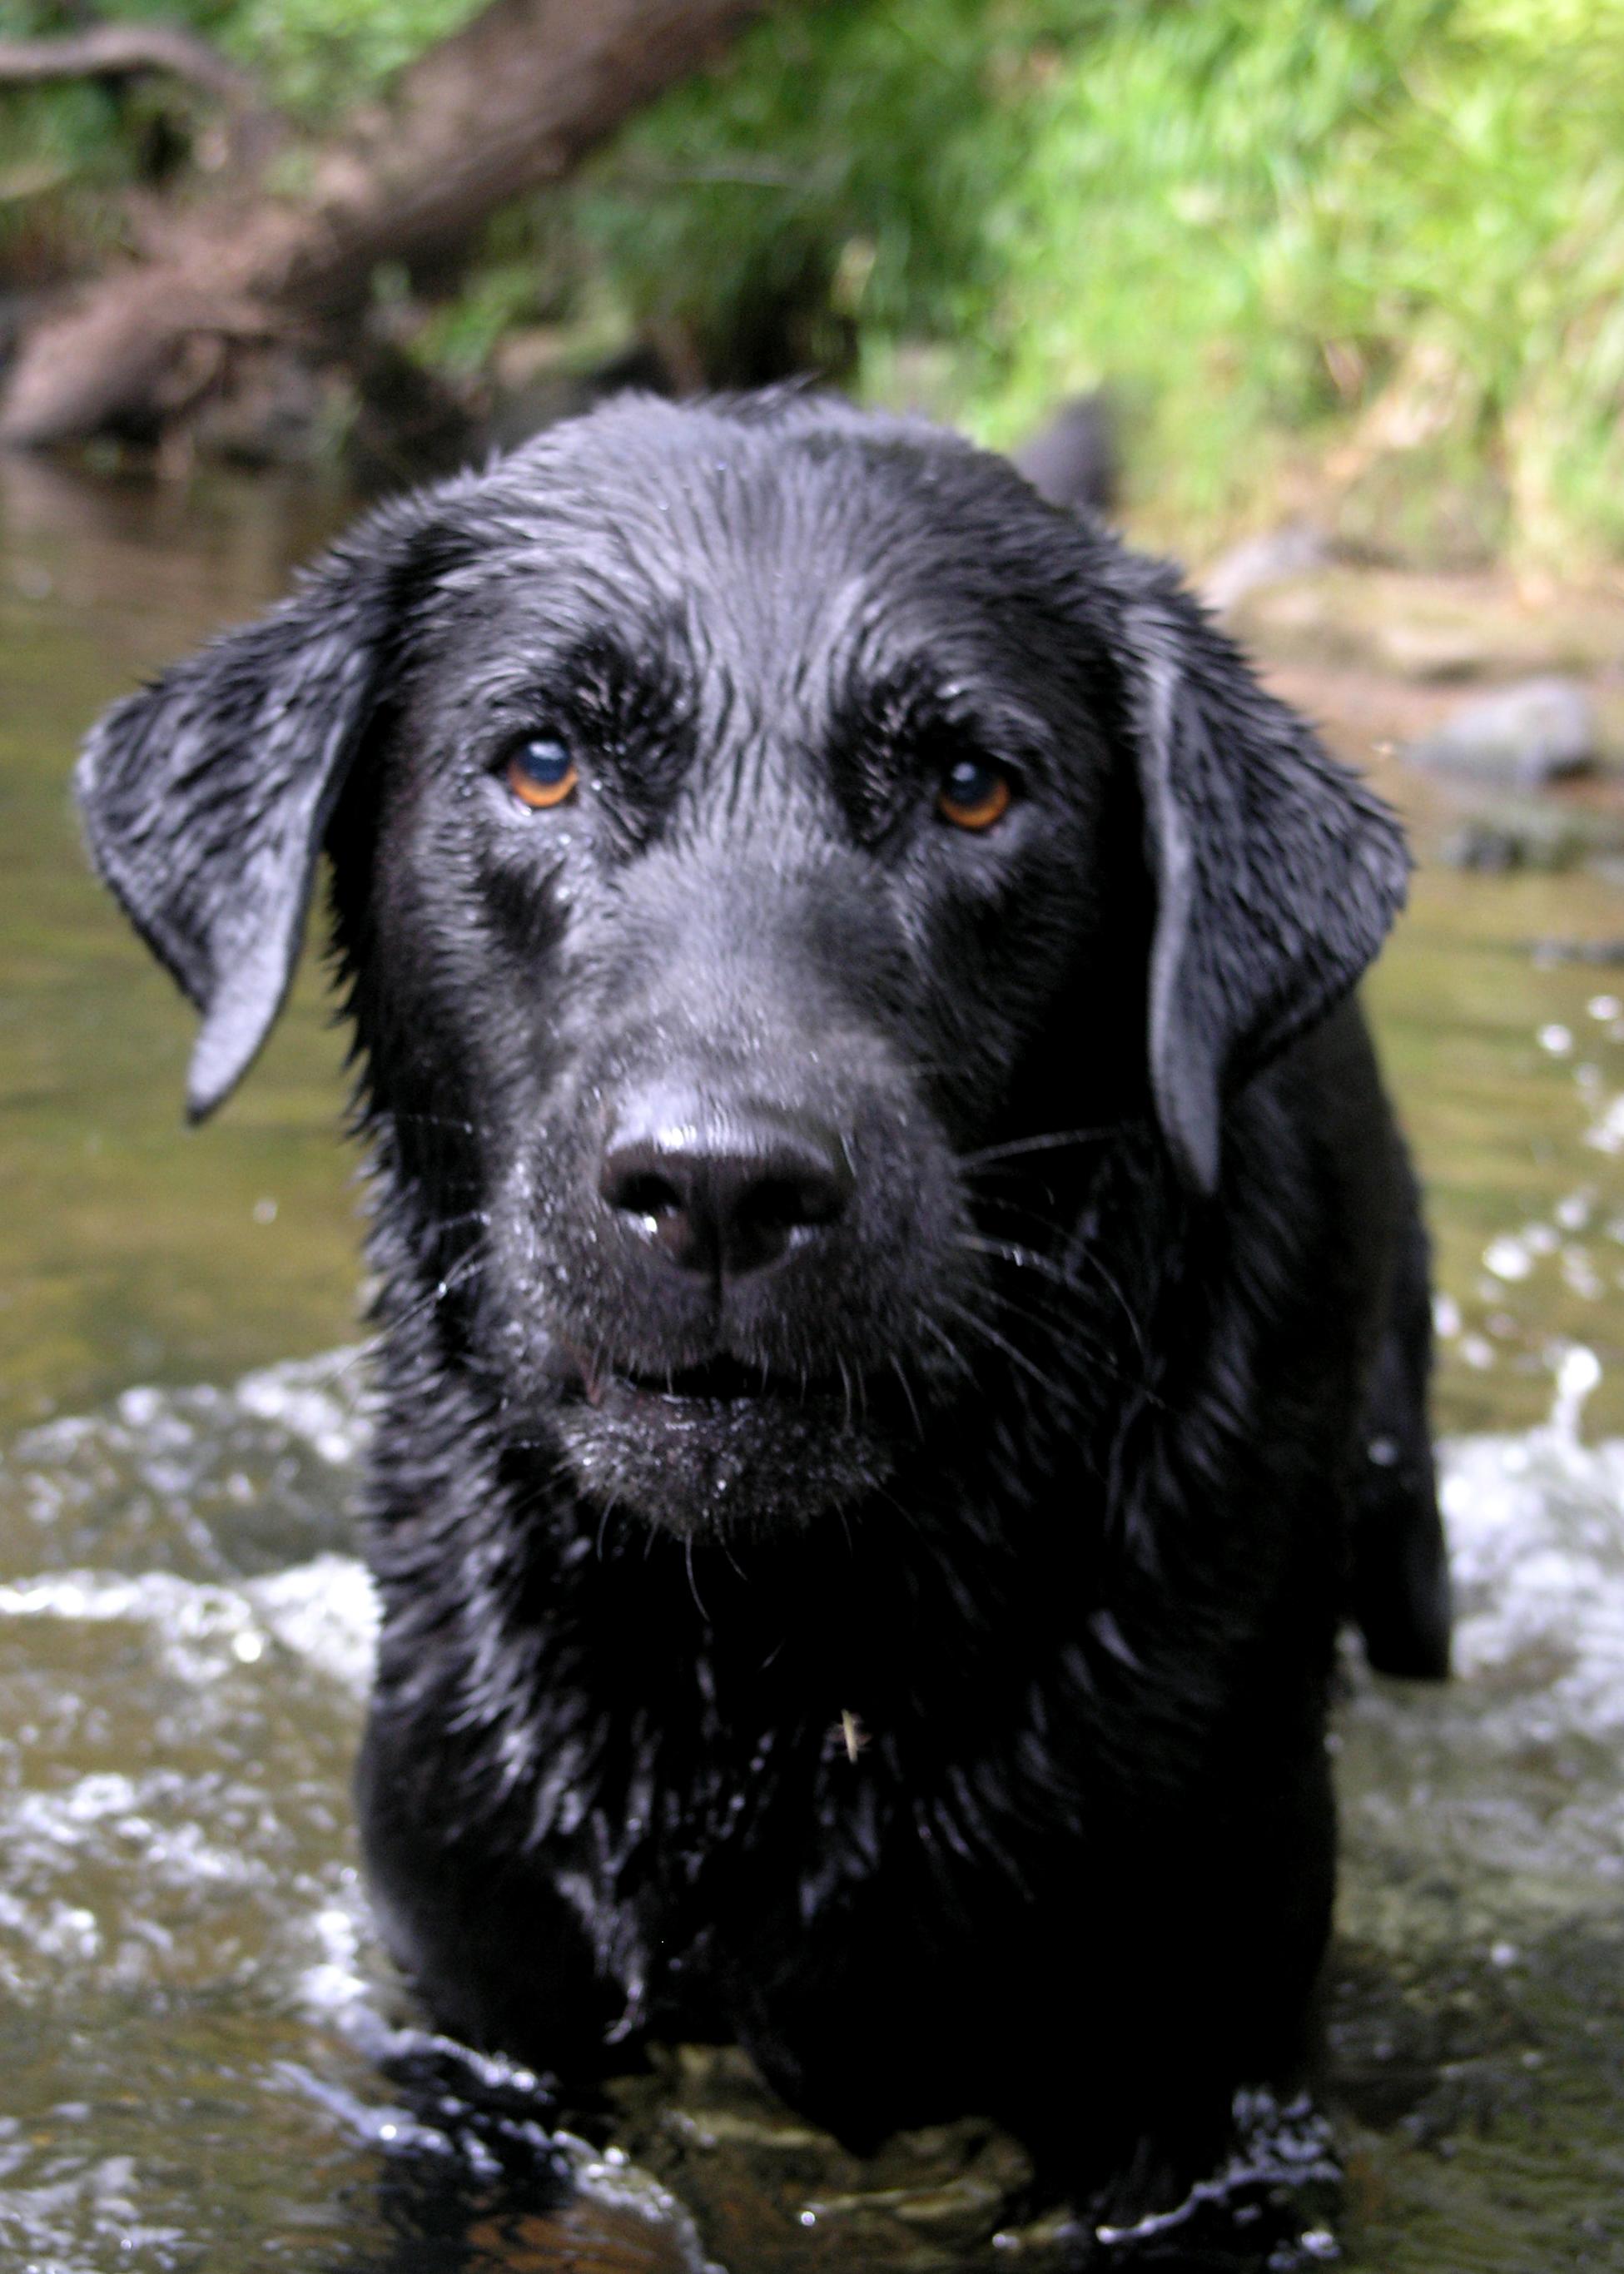 File:Labrador Retriever water.jpg - Wikipedia